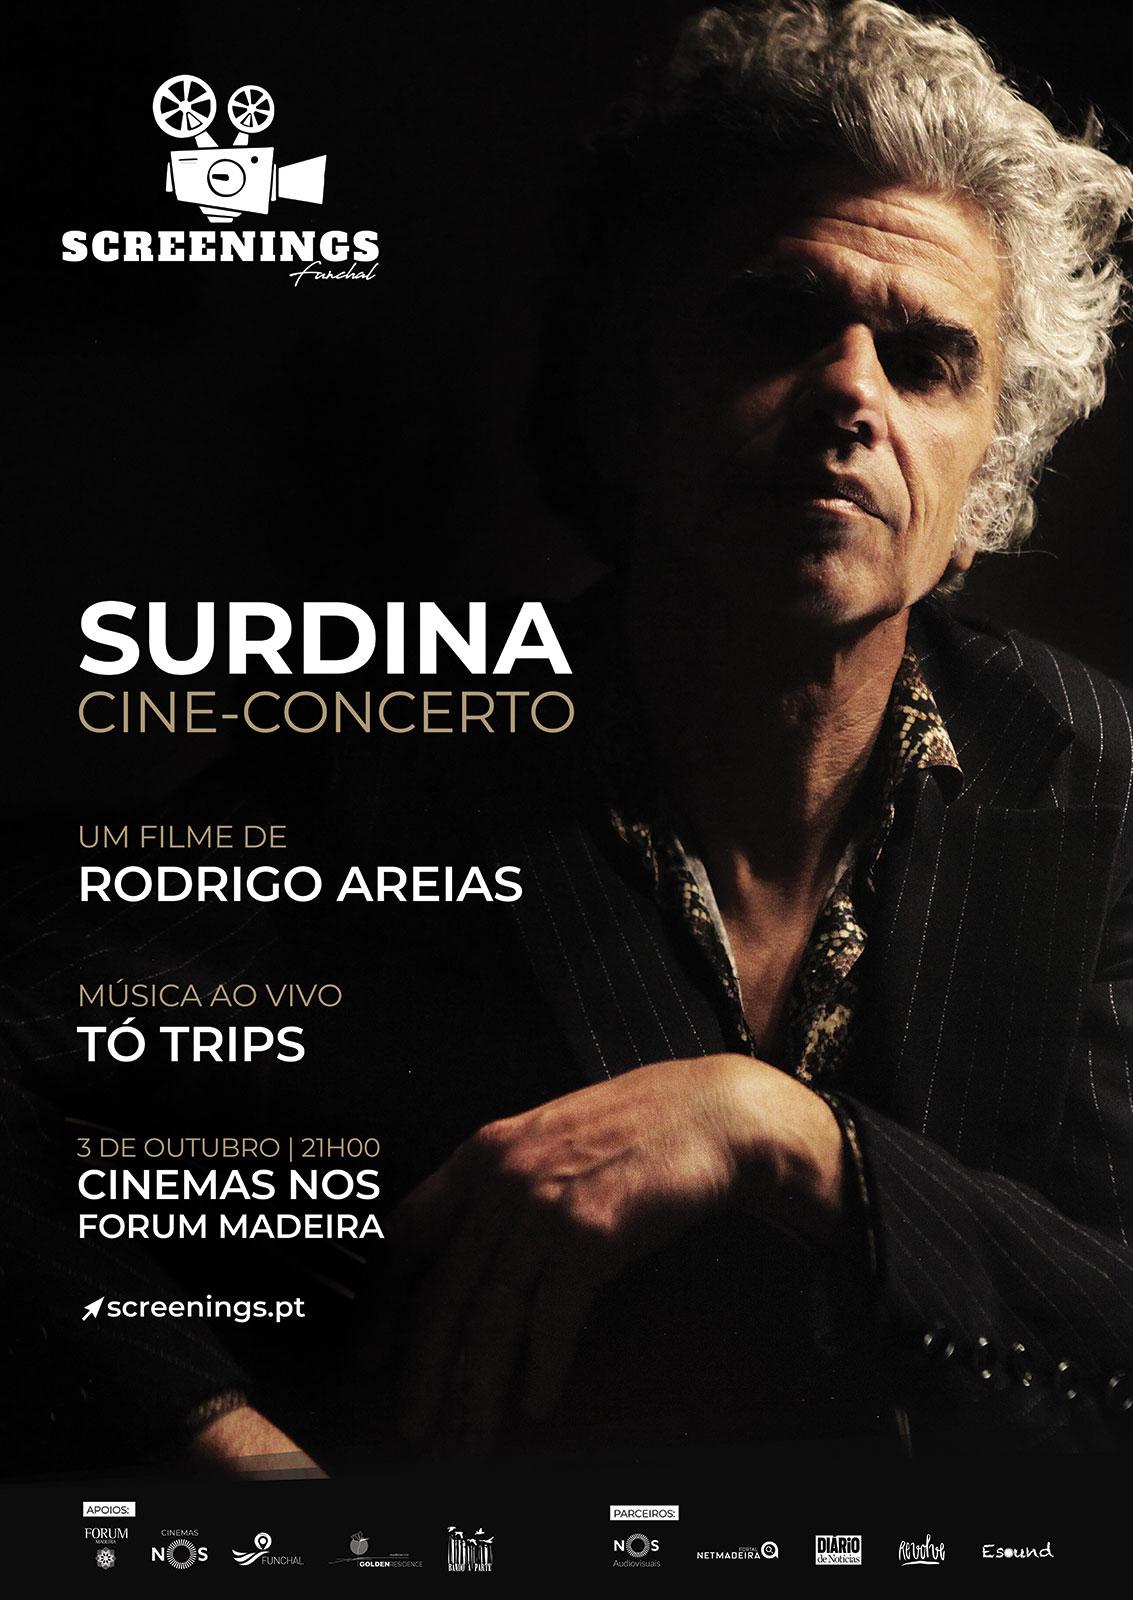 Surdina Cineconcerto